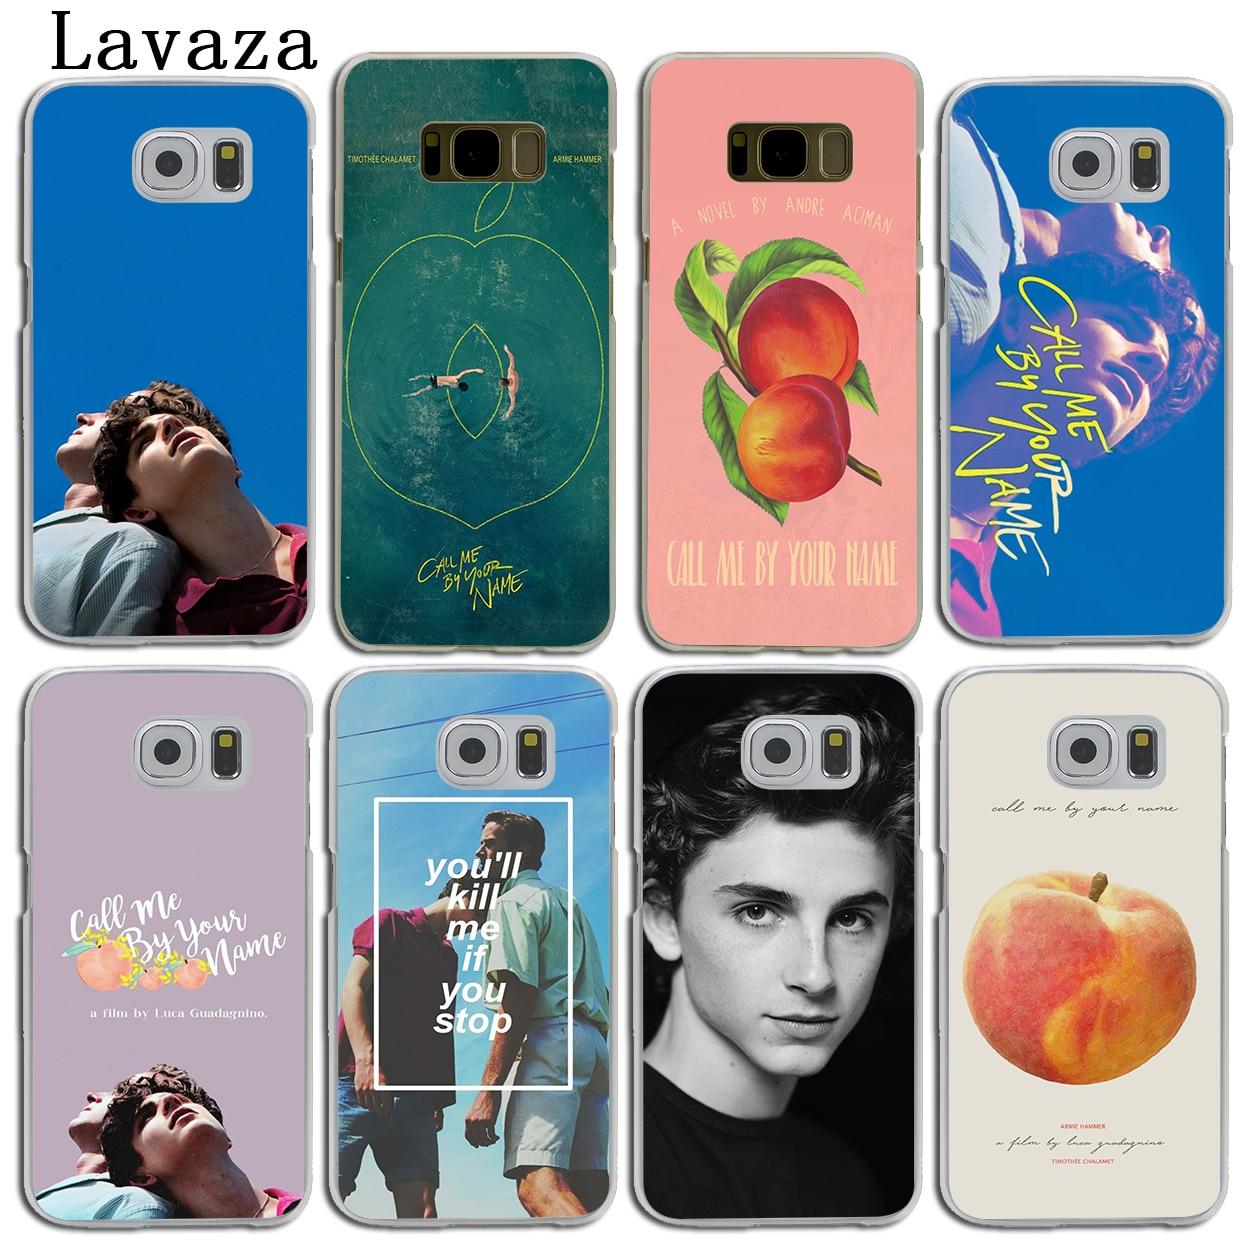 Lavaza Call Me на Ваше имя жесткий кожи телефон чехла для samsung Galaxy S7 S6 край S8 S9 плюс s3 S4 S5 и мини S9 крышка